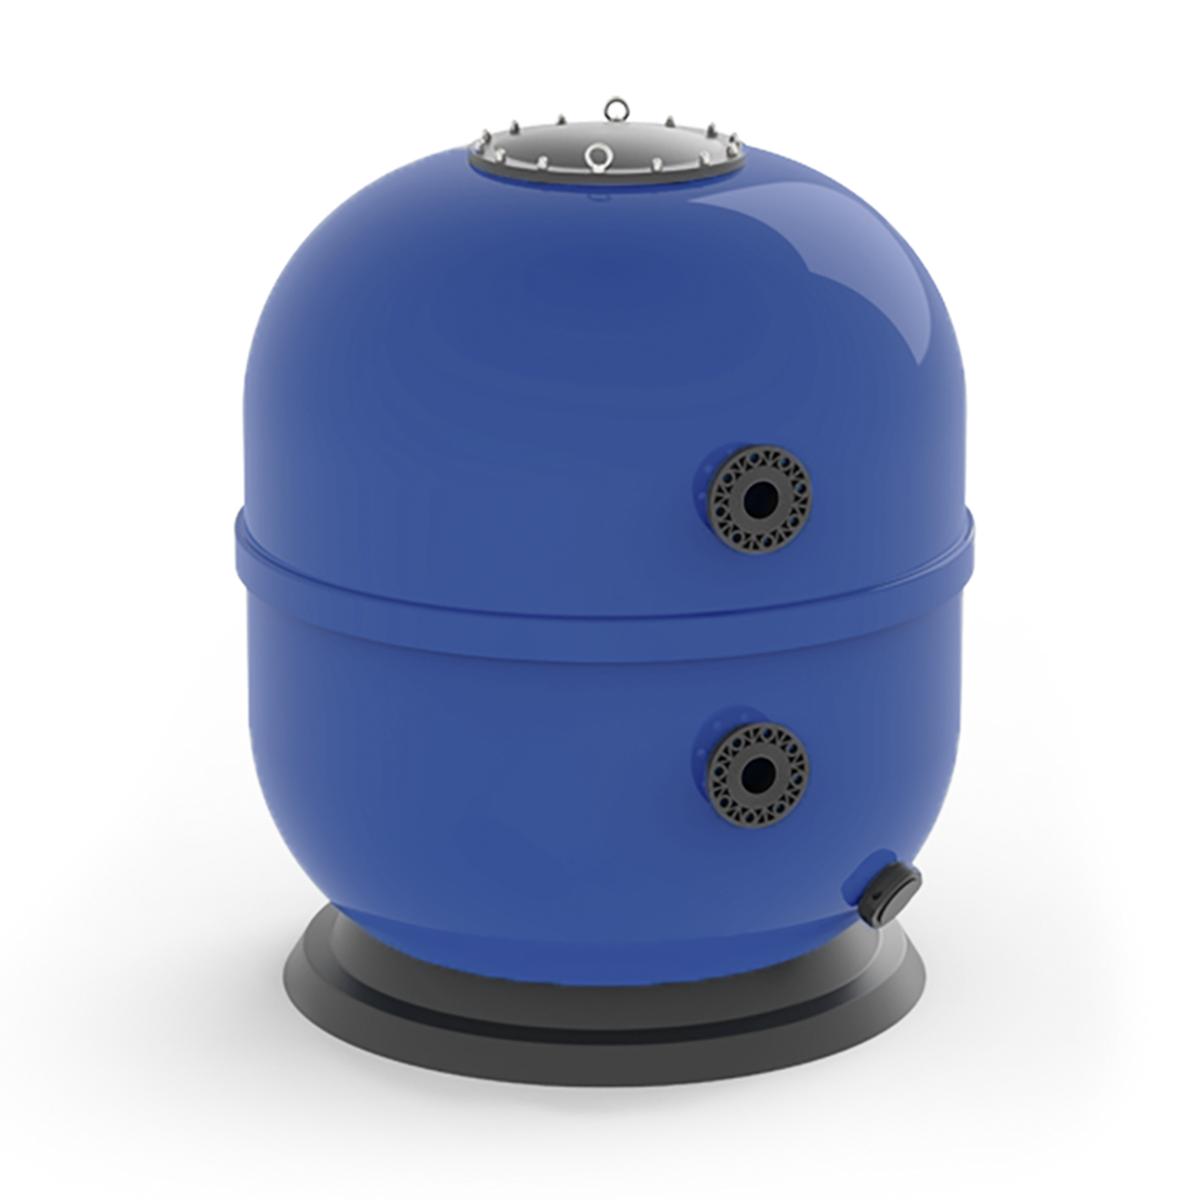 "Smart Polyester Filter laminiert, side mount, blau d1050, GFK Deckel 400 mm schwarz, Ablass d75 mm inkl. 1"" Entleerungsstopfen, Filtermediumhöhe 1000 mm, PVC Flanschanschluss d90 mm Smart Polyester Filter laminiert, side mount, blau d1050, GFK Deckel 400 mm schwarz, Ablass d75 mm inkl. 1"" Entleerungsstopfen, Filtermediumhöhe 1000 mm, PVC Flanschanschluss d90 mm"